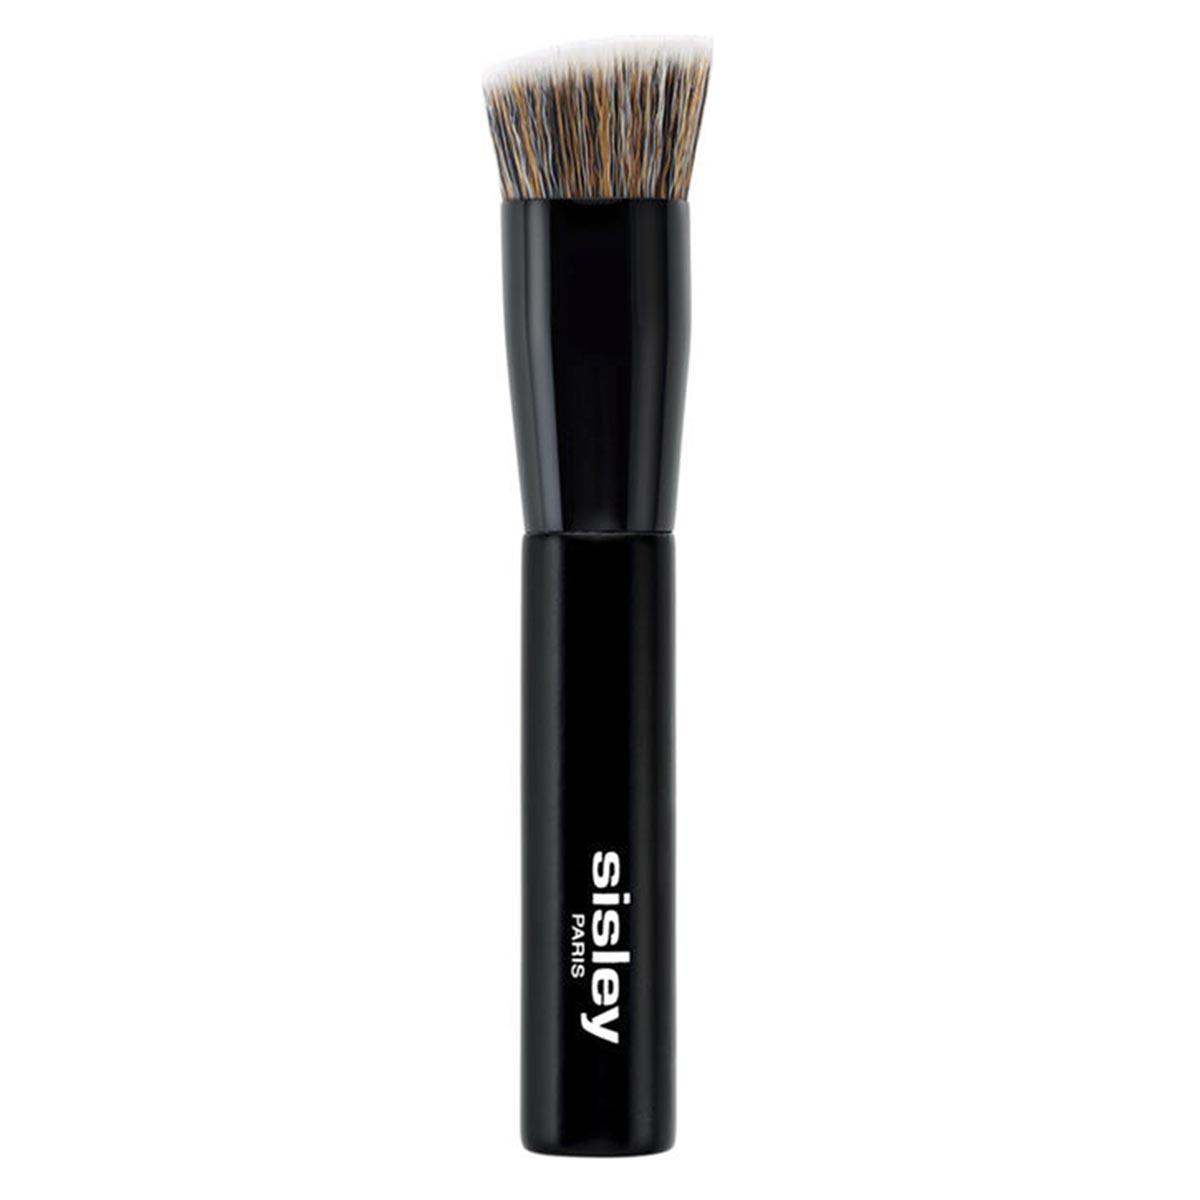 Sisley foundation brush 1u